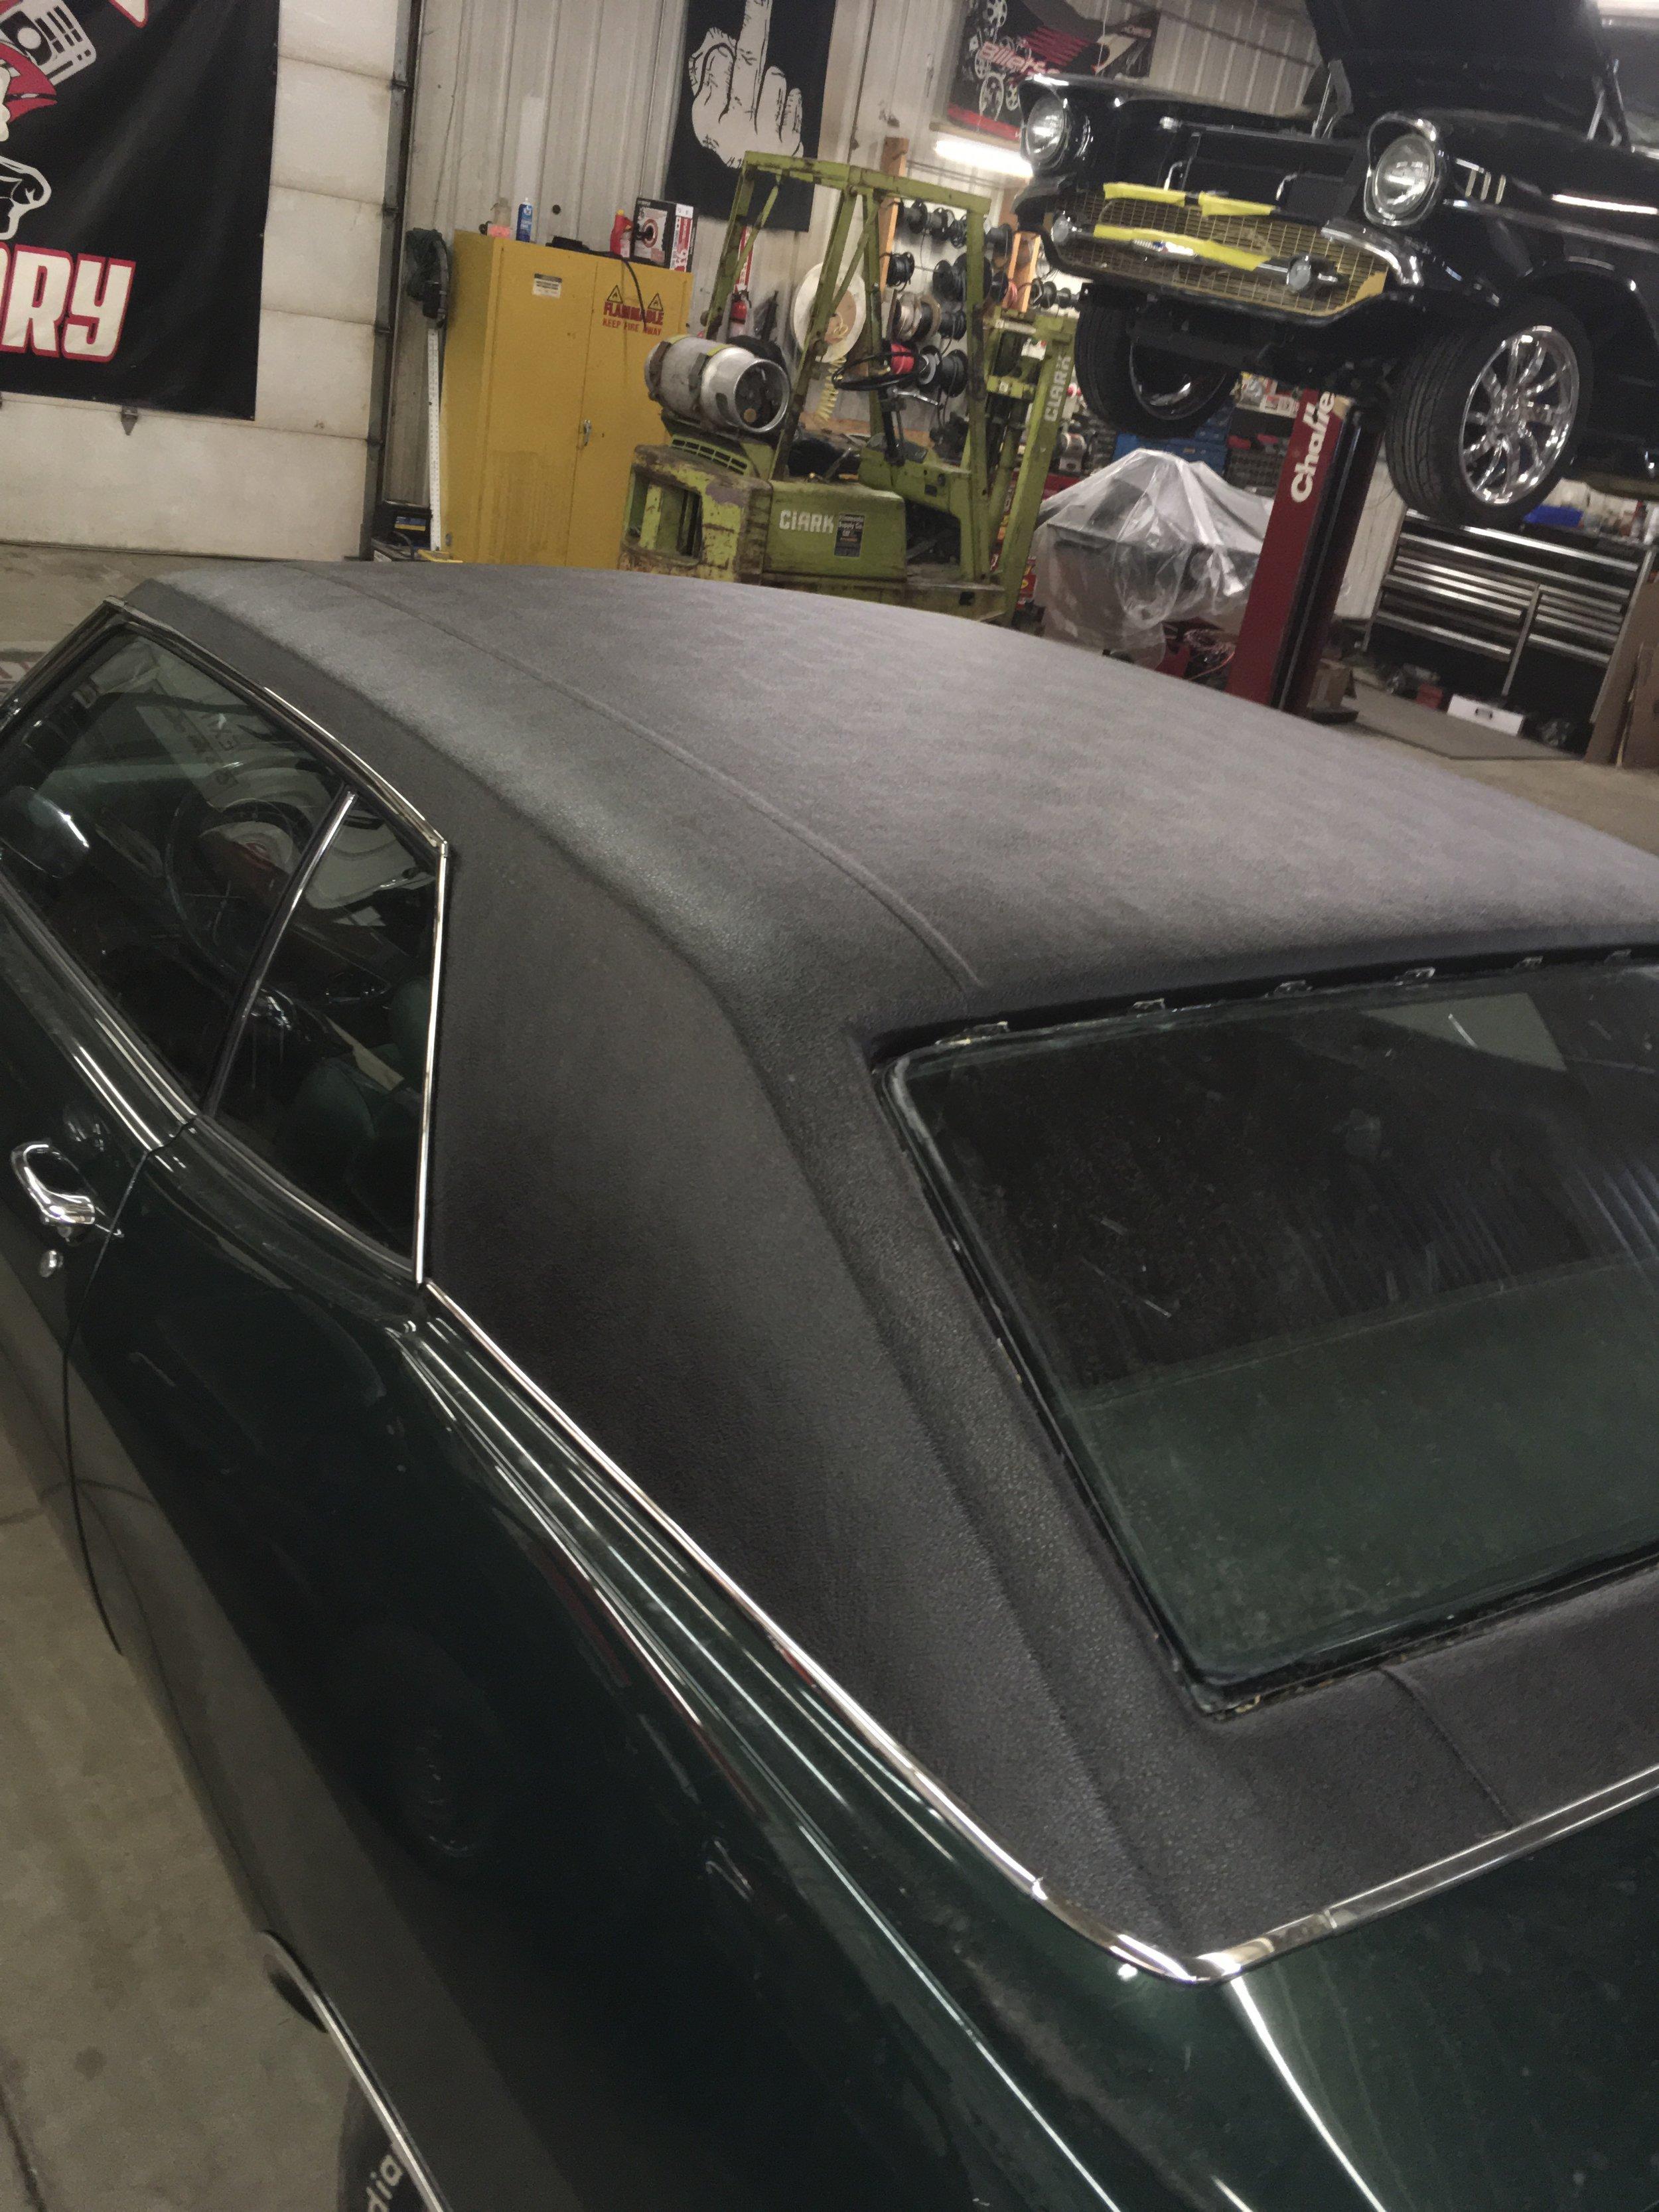 1970-impala-minneapolis-car-restoration-hot-rod-factory-new-paint.jpg